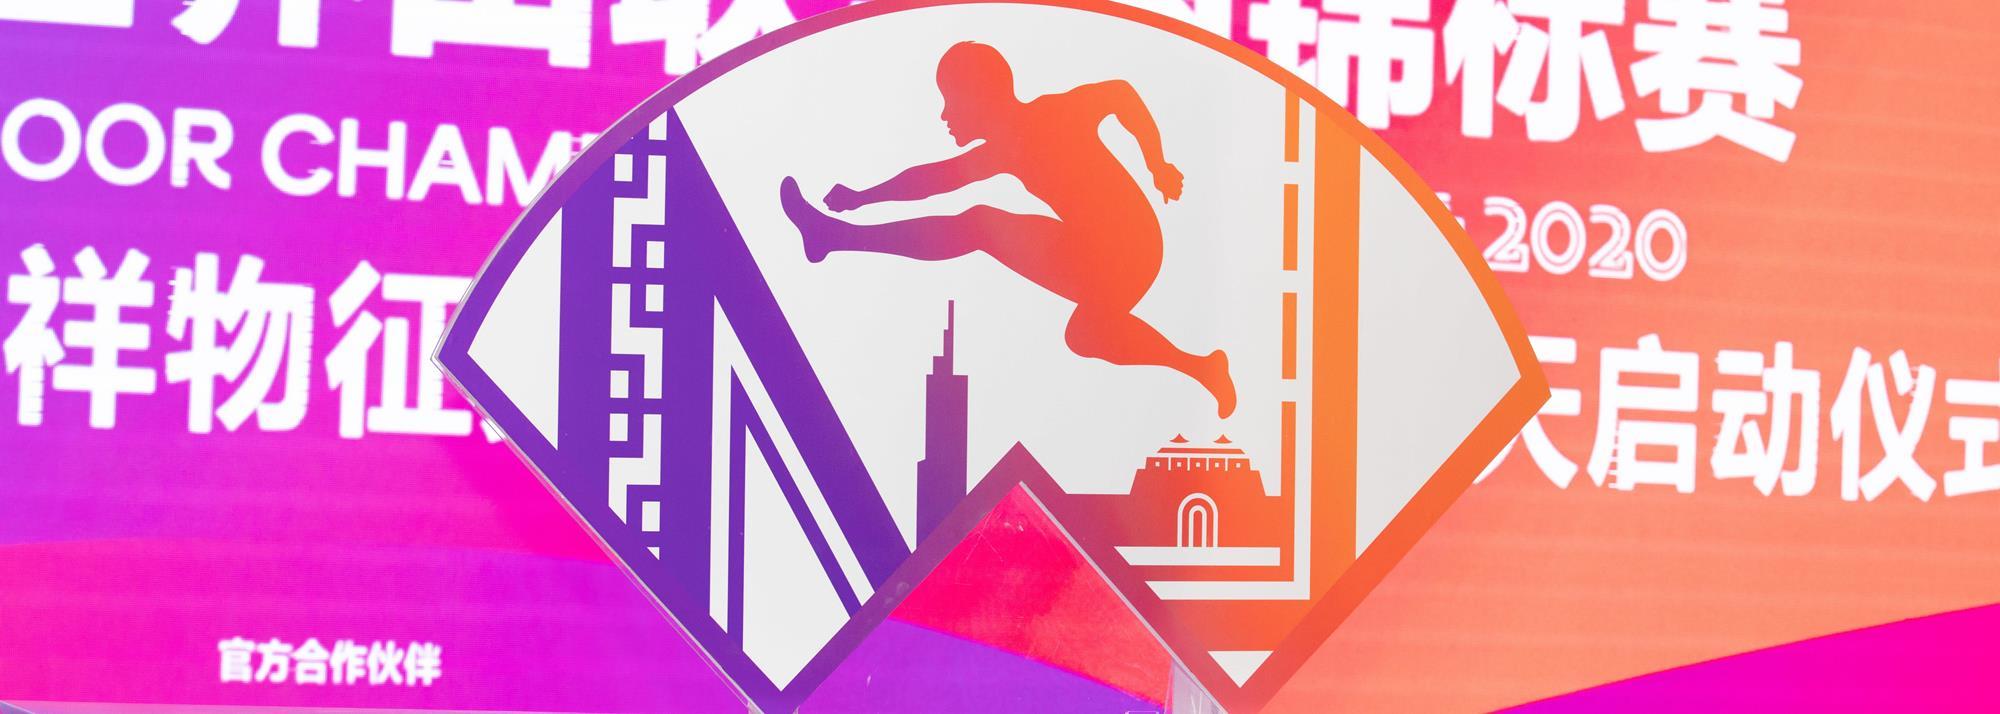 Emblem and slogan for World Athletics Indoor Championships Nanjing 2020 unveiled